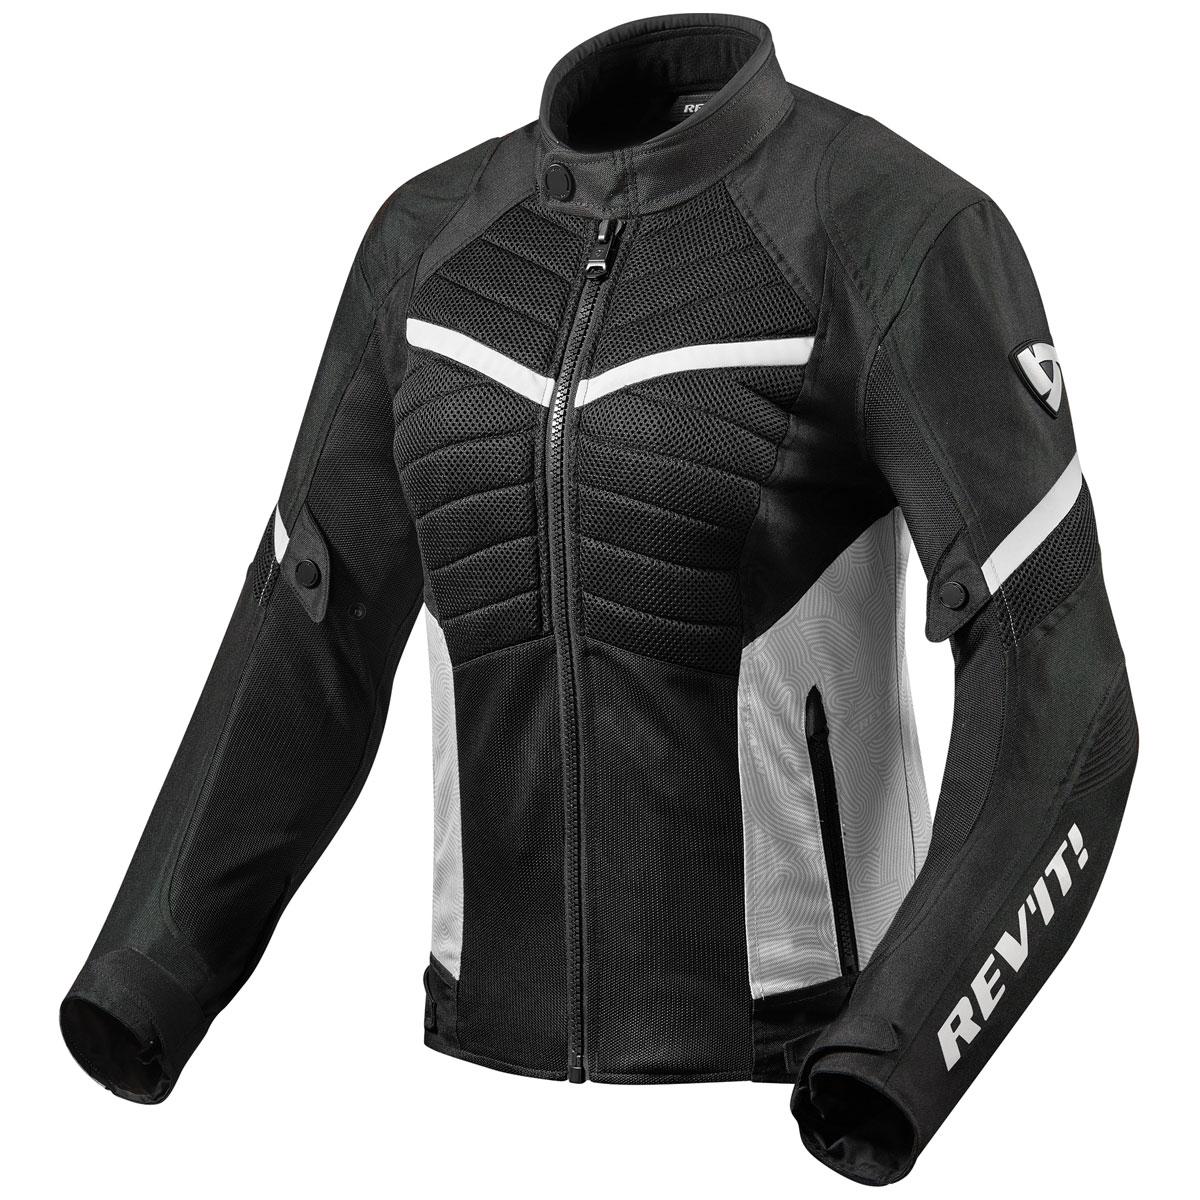 REV′IT! Women's Arc Air Black/White Textile Jacket